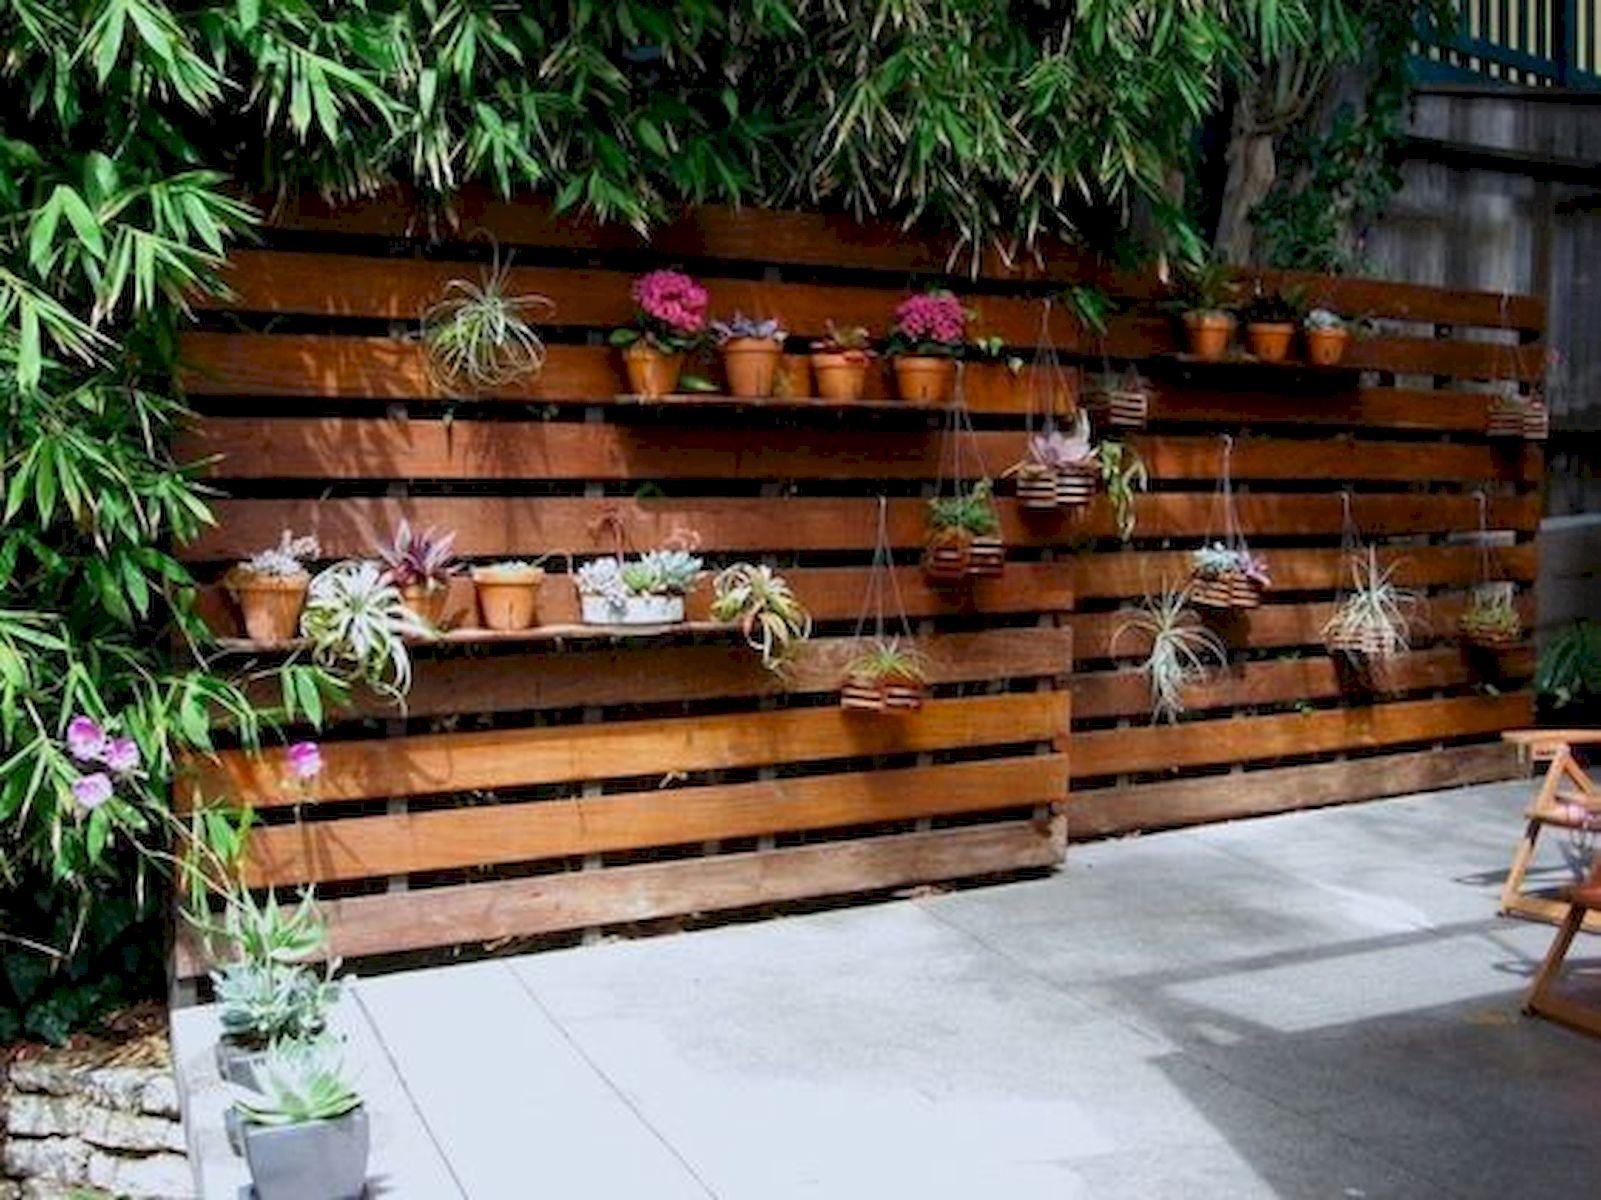 50 Awesome DIY Hanging Plants Ideas For Modern Backyard Garden (20)